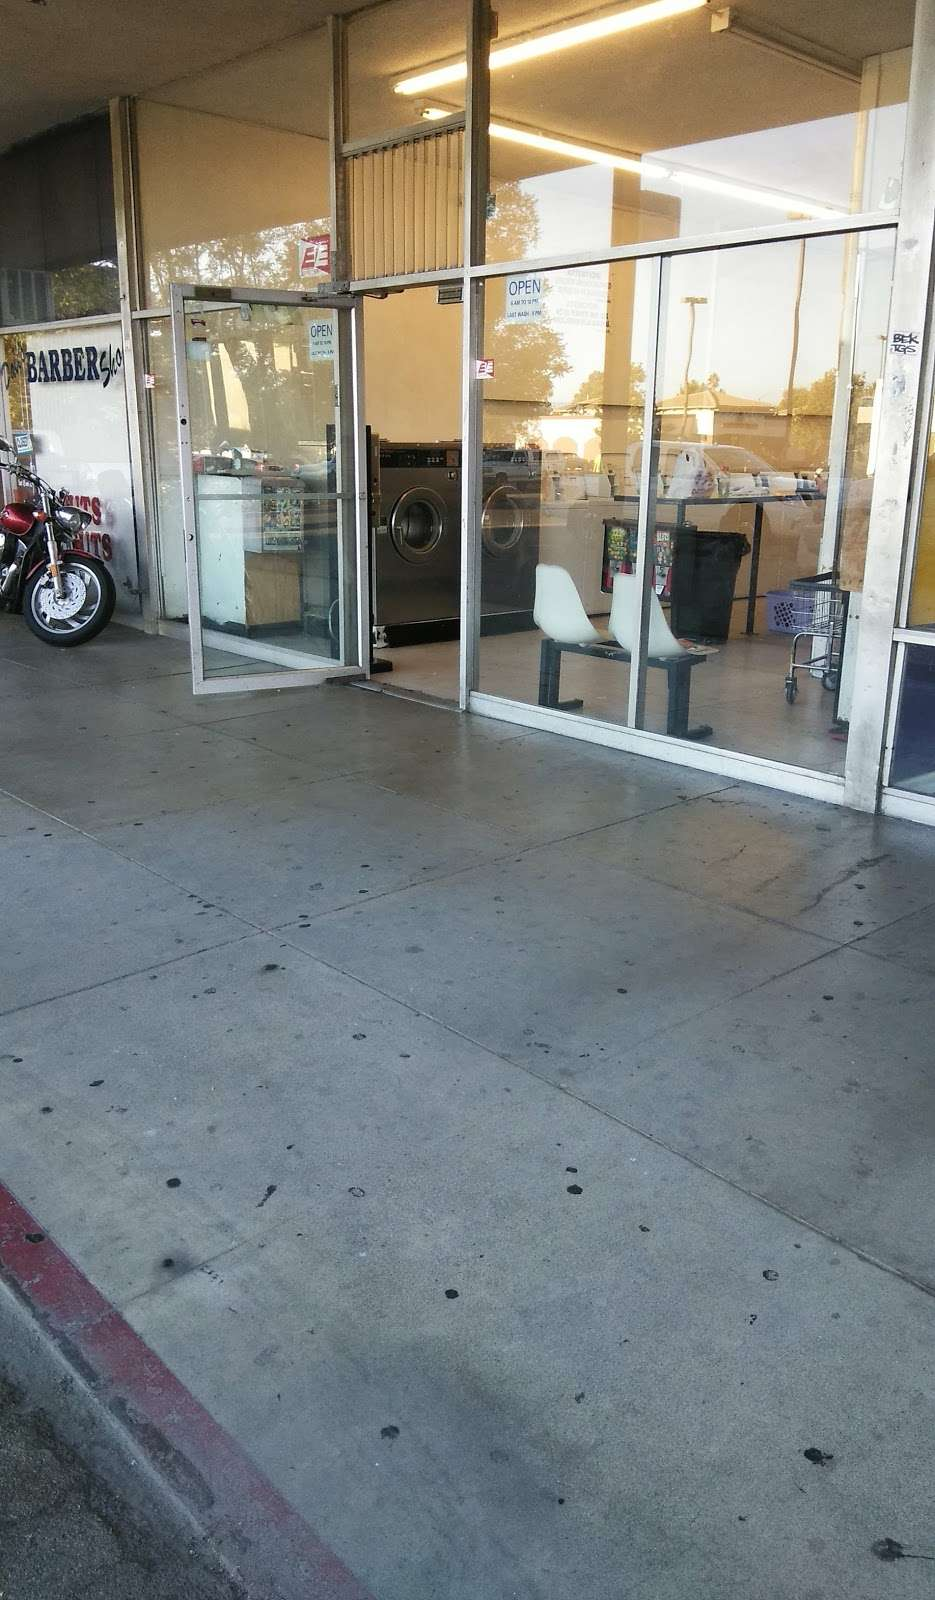 Pinky White Coin Laundry - laundry  | Photo 1 of 1 | Address: Chino, CA 91710, USA